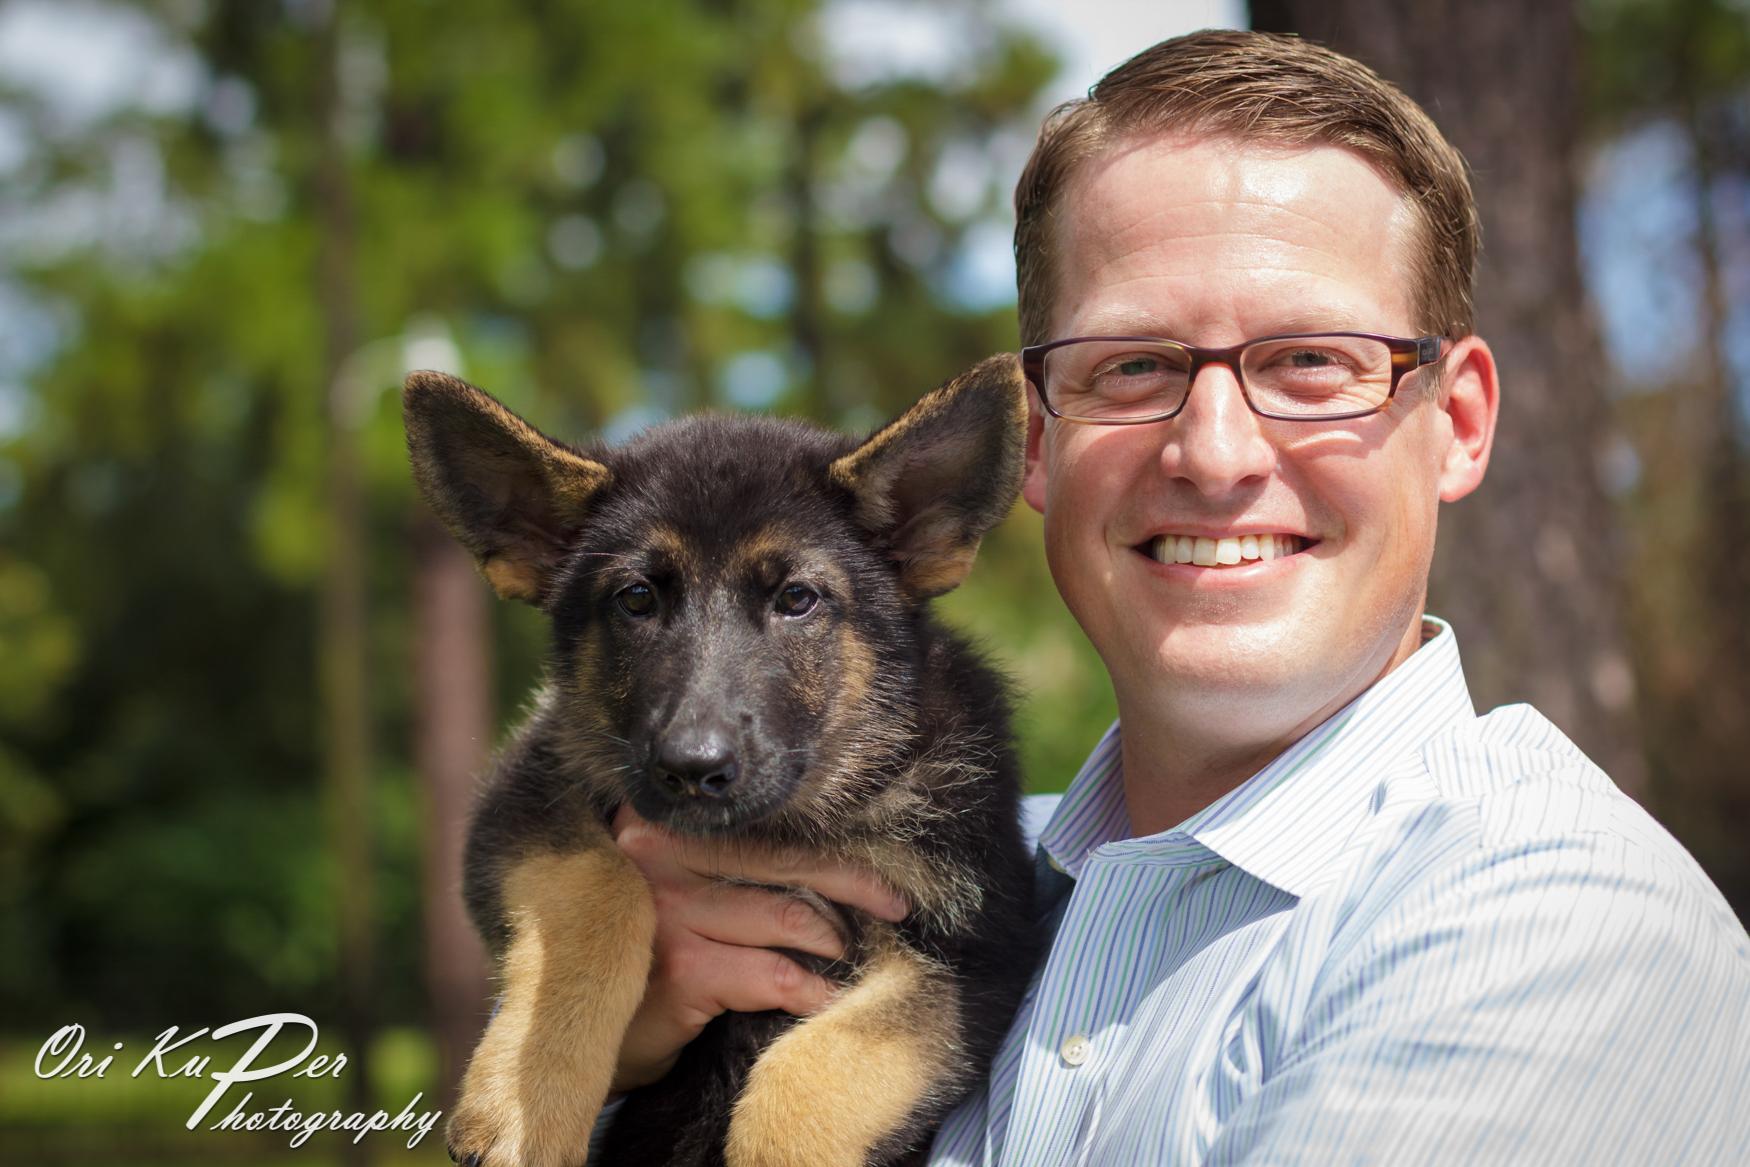 headshots portraits personal branding Houston photographer Ori Kuper 004 IMG_4176_www.HOUVideographe